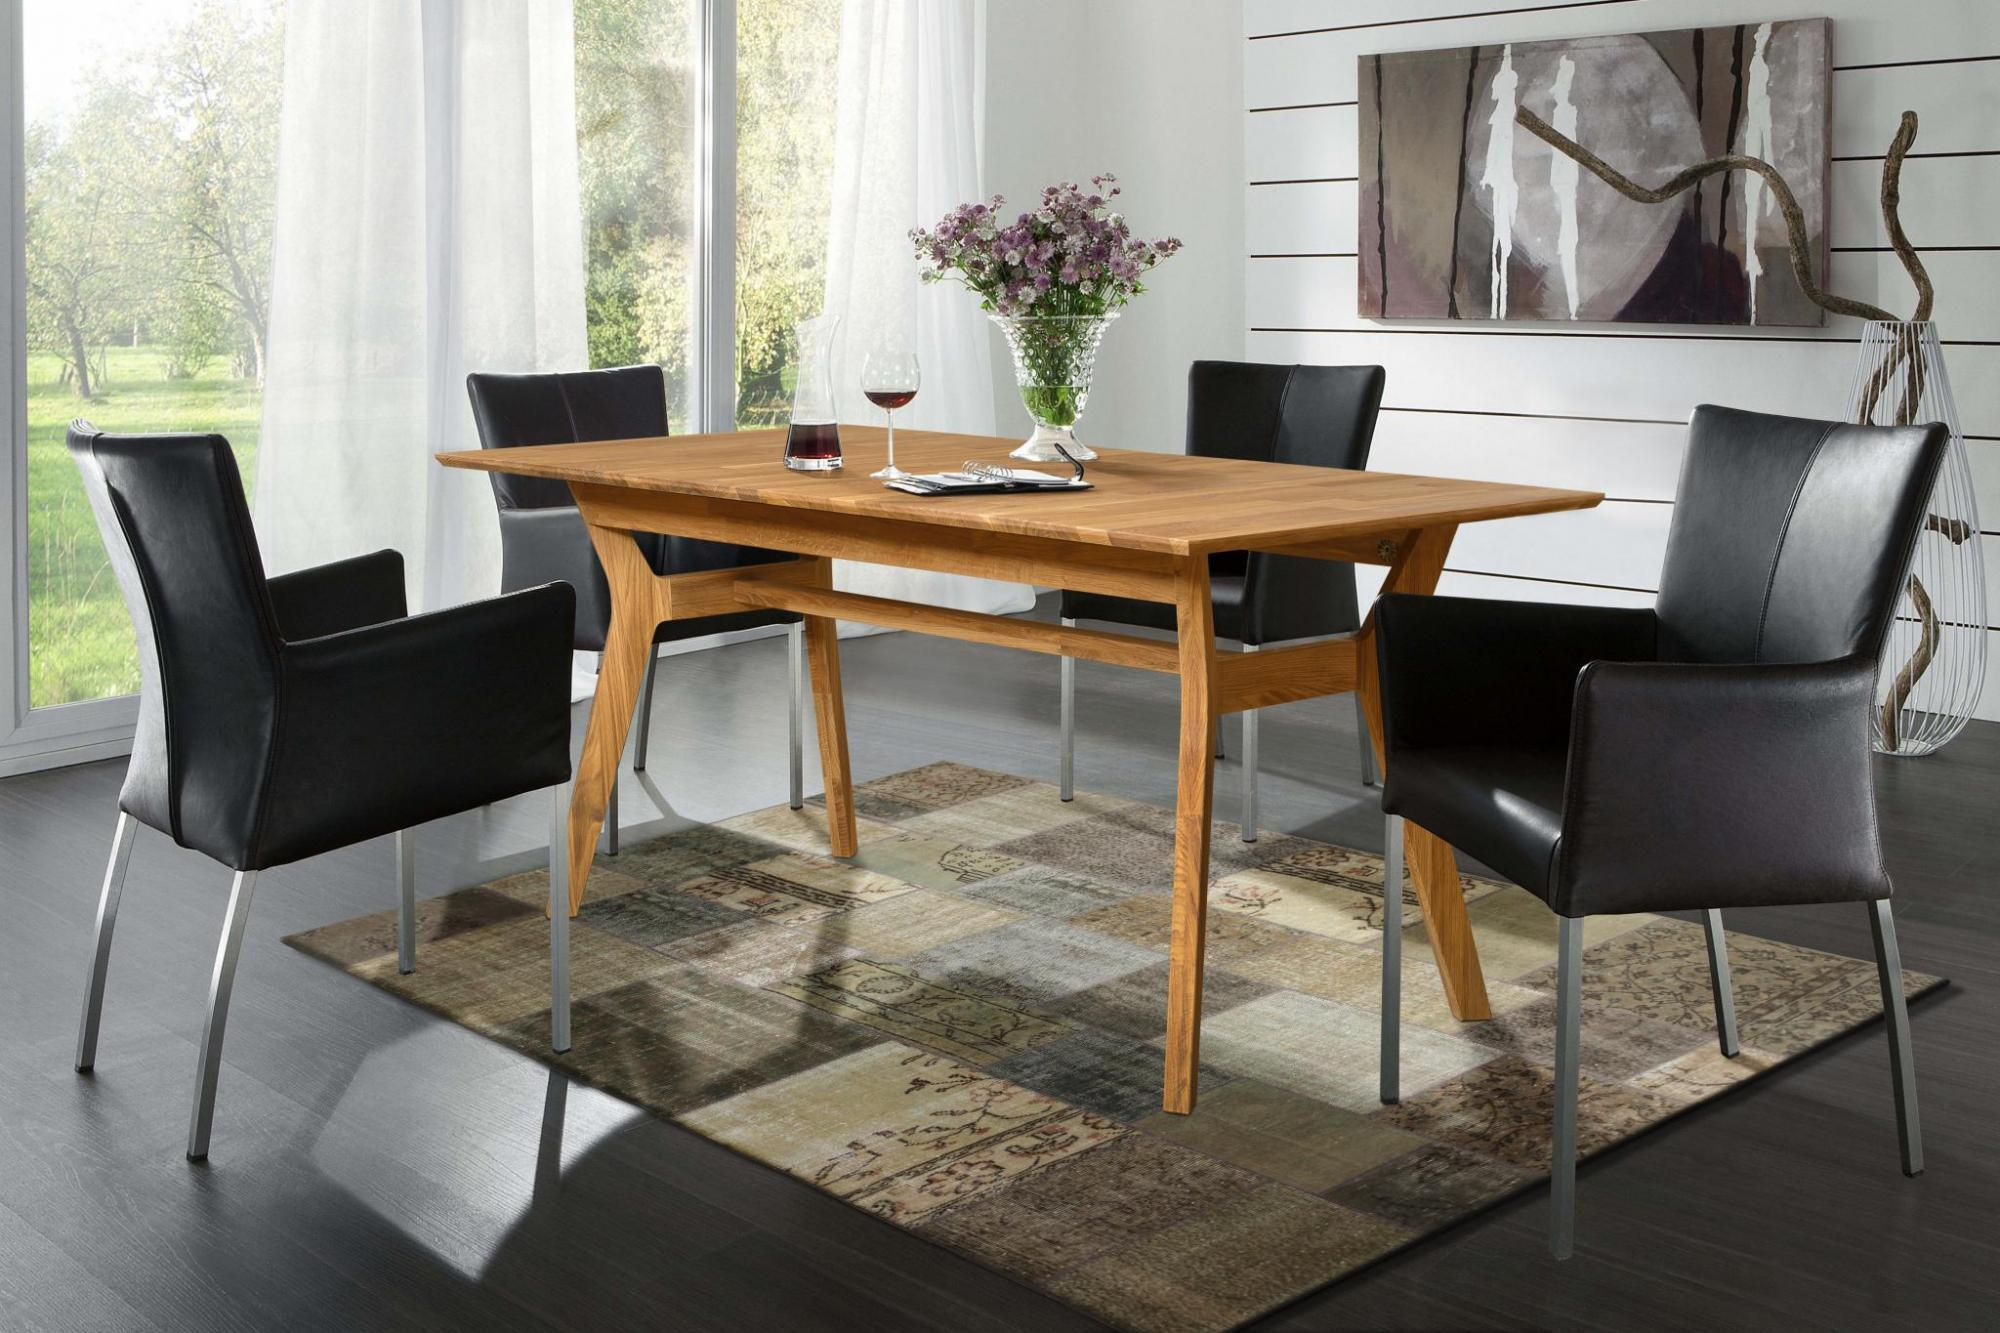 int_Table_Helsinki